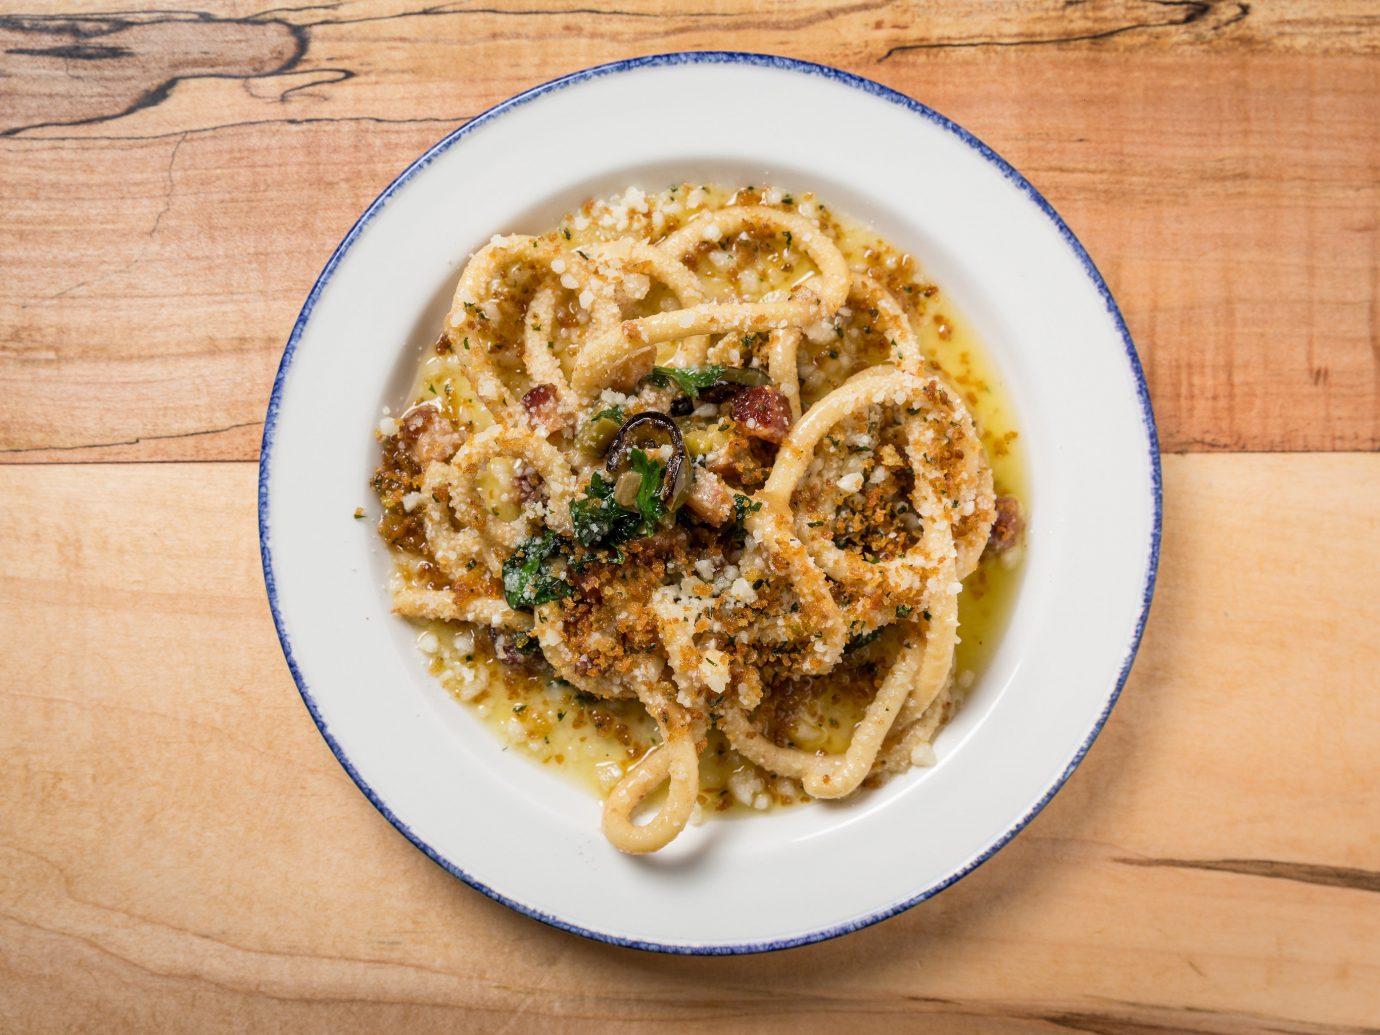 Food + Drink table food plate dish cuisine spaghetti wooden noodle carbonara produce italian food vegetarian food asian food udon pasta meal vegetable